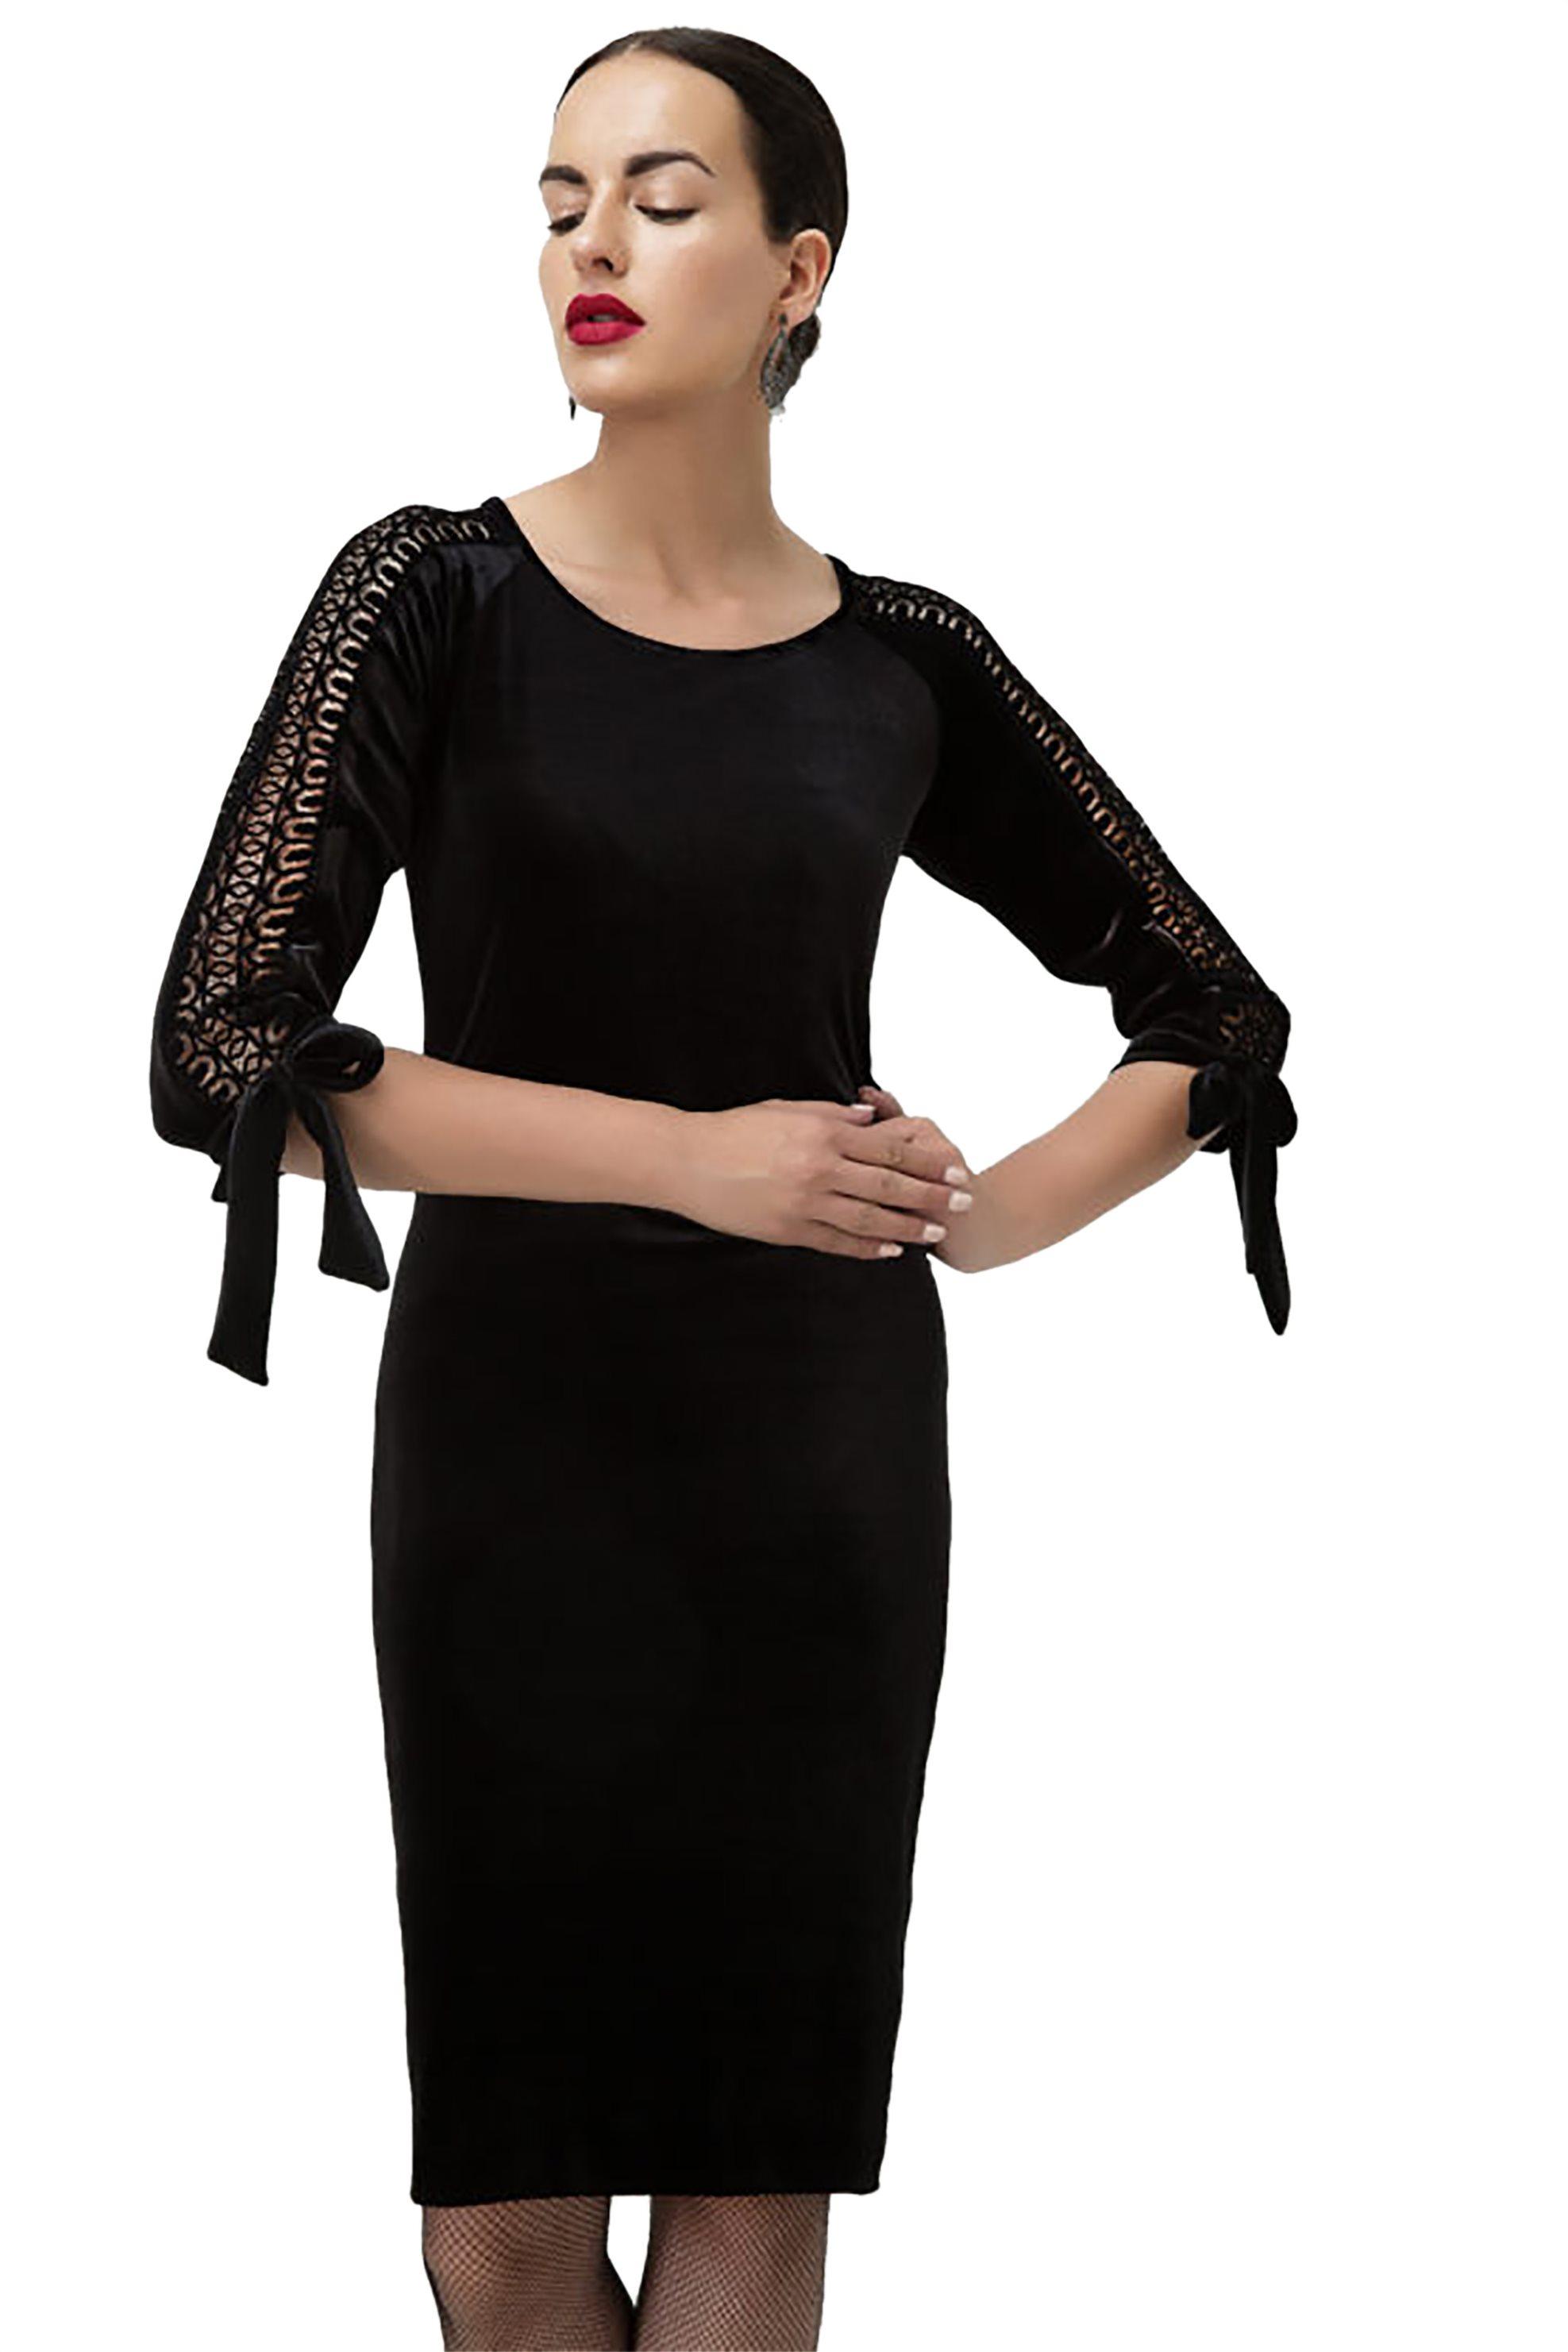 Billy Sabbado γυναικείο φόρεμα απο βελούδο με δαντέλα - 0103916961 - Μαύρο γυναικα   ρουχα   φορέματα   midi φορέματα